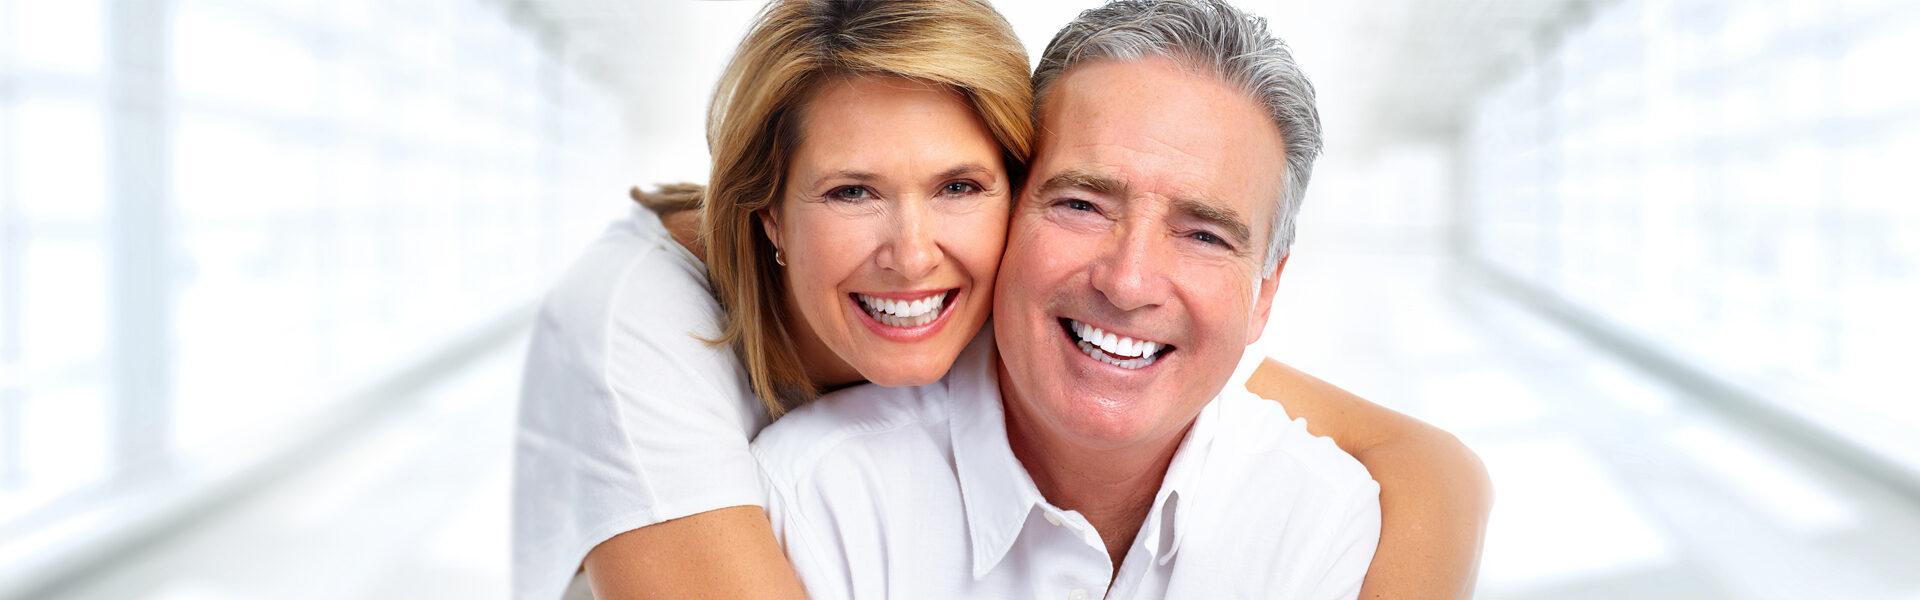 Dental Implants in Richmond Hill, ON